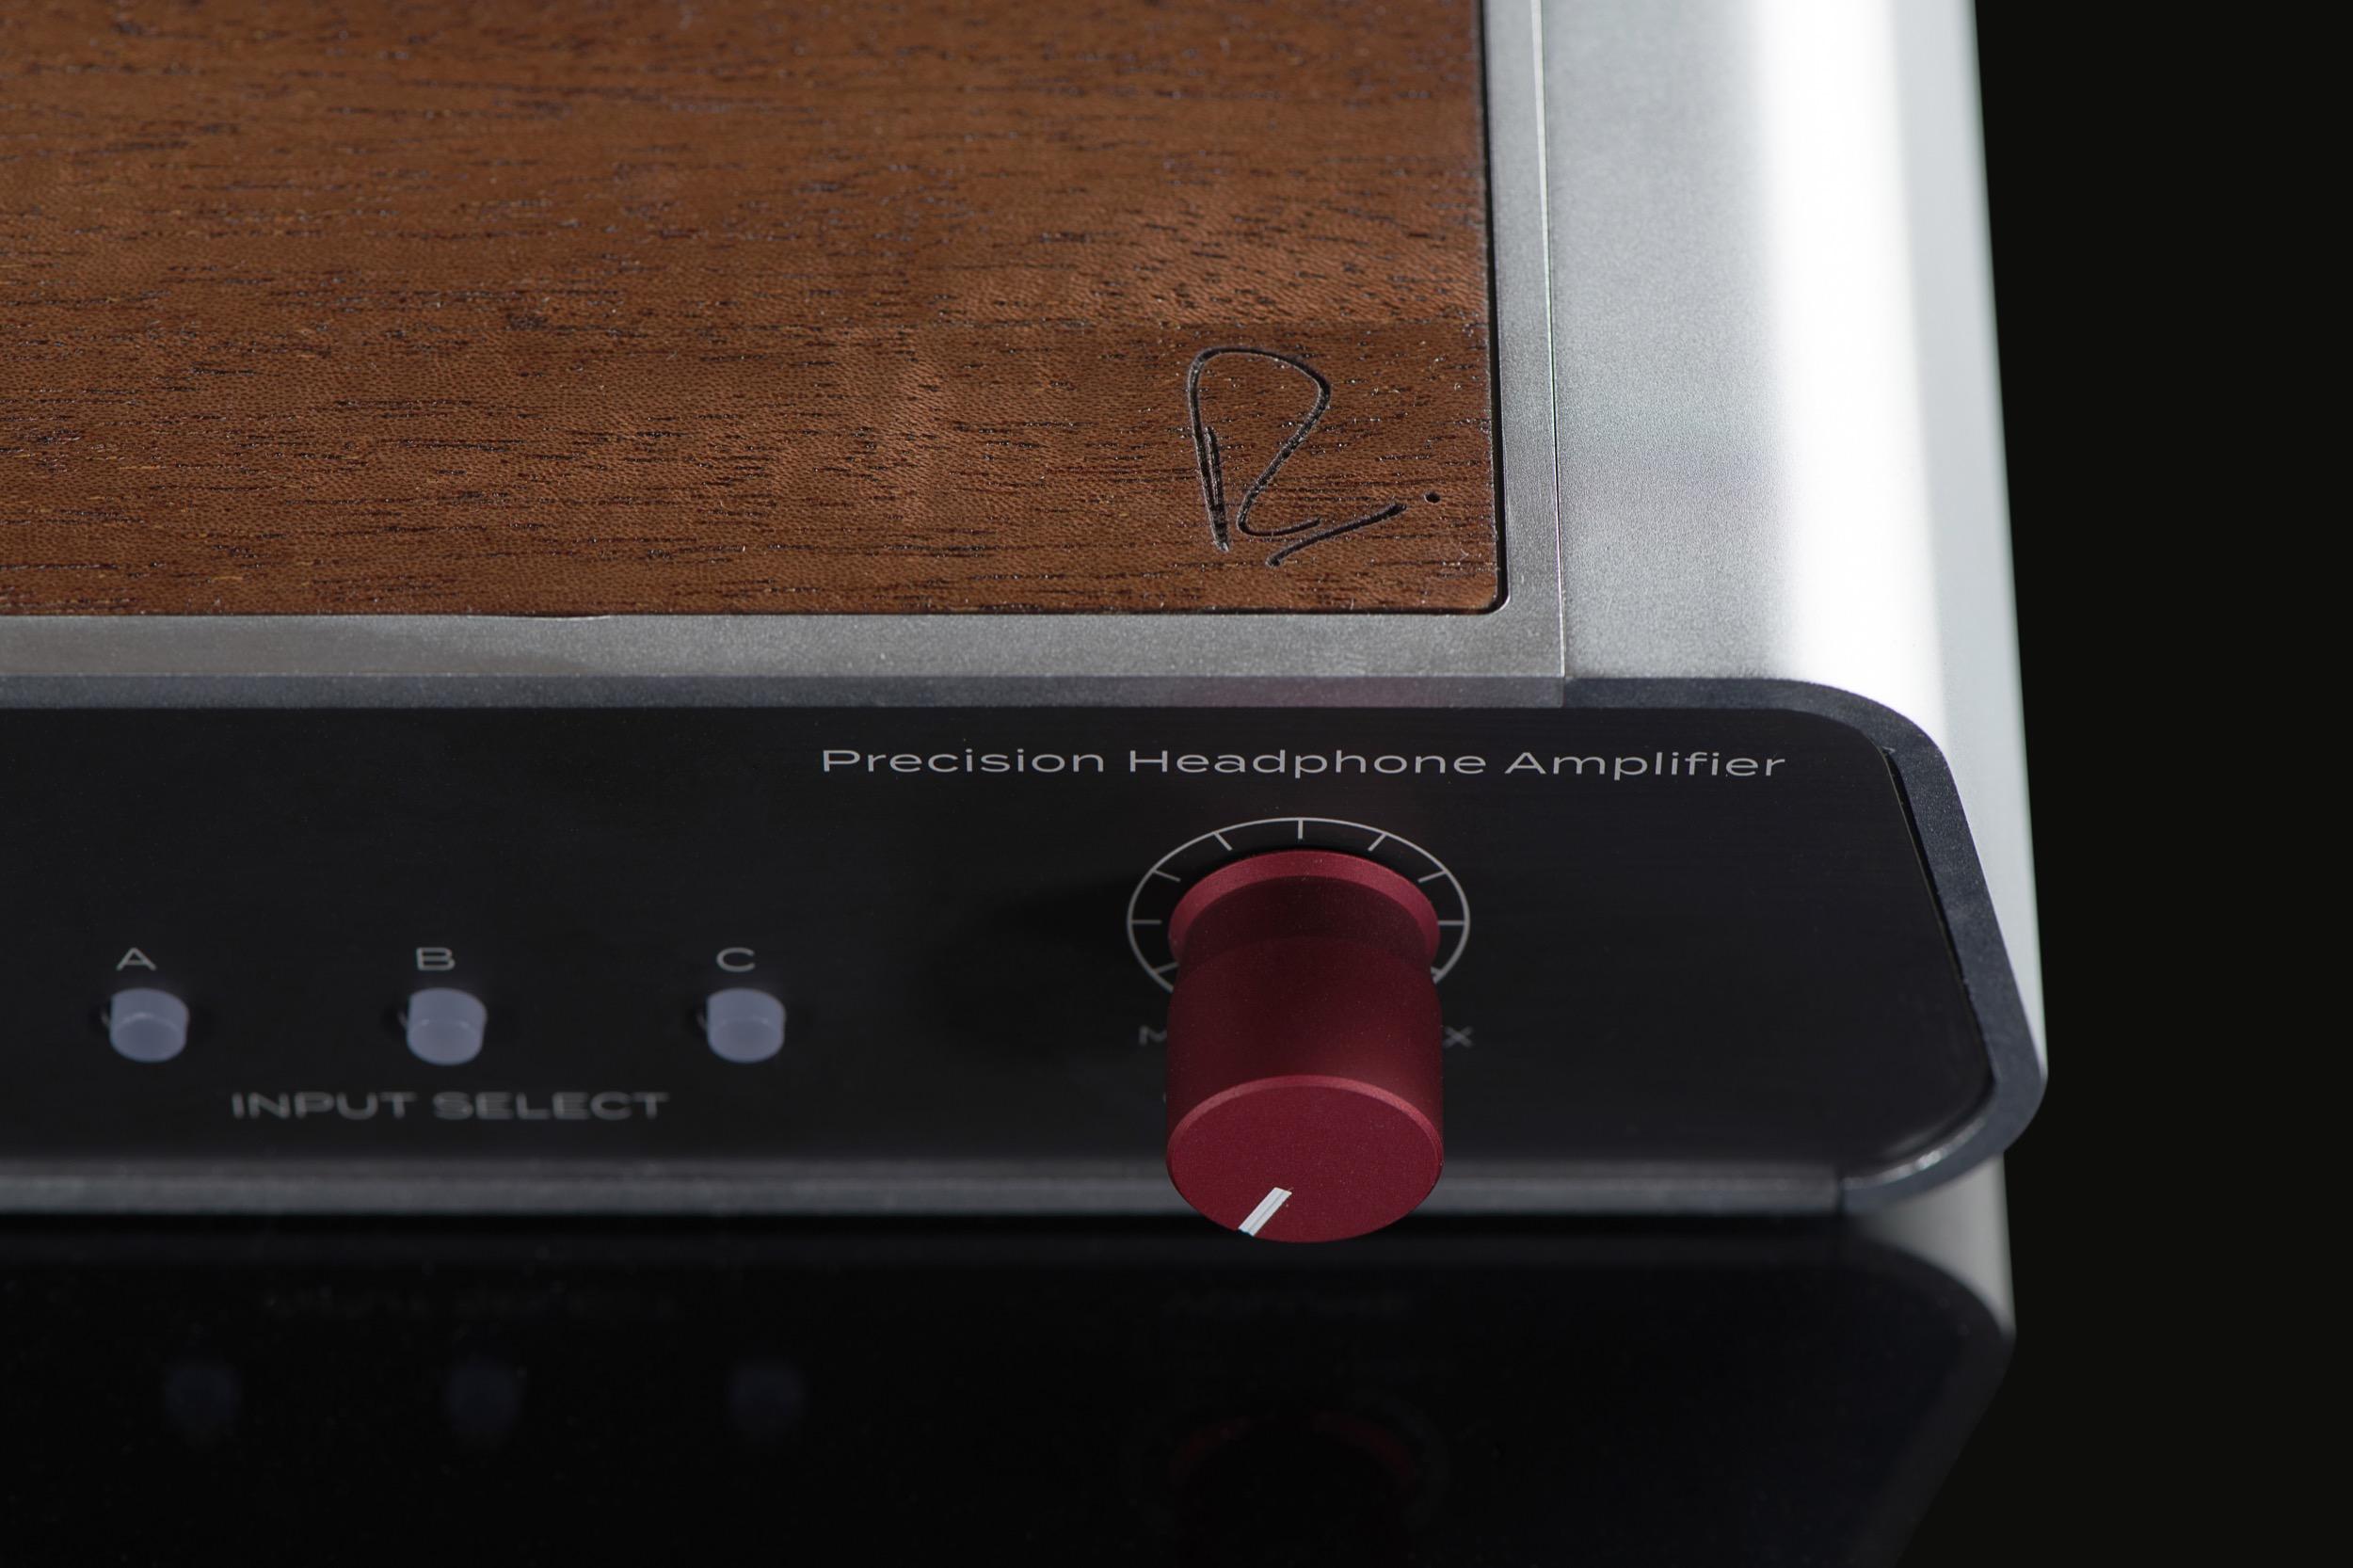 The Fidelice Precision Headphone Amplifier — Fidelice™